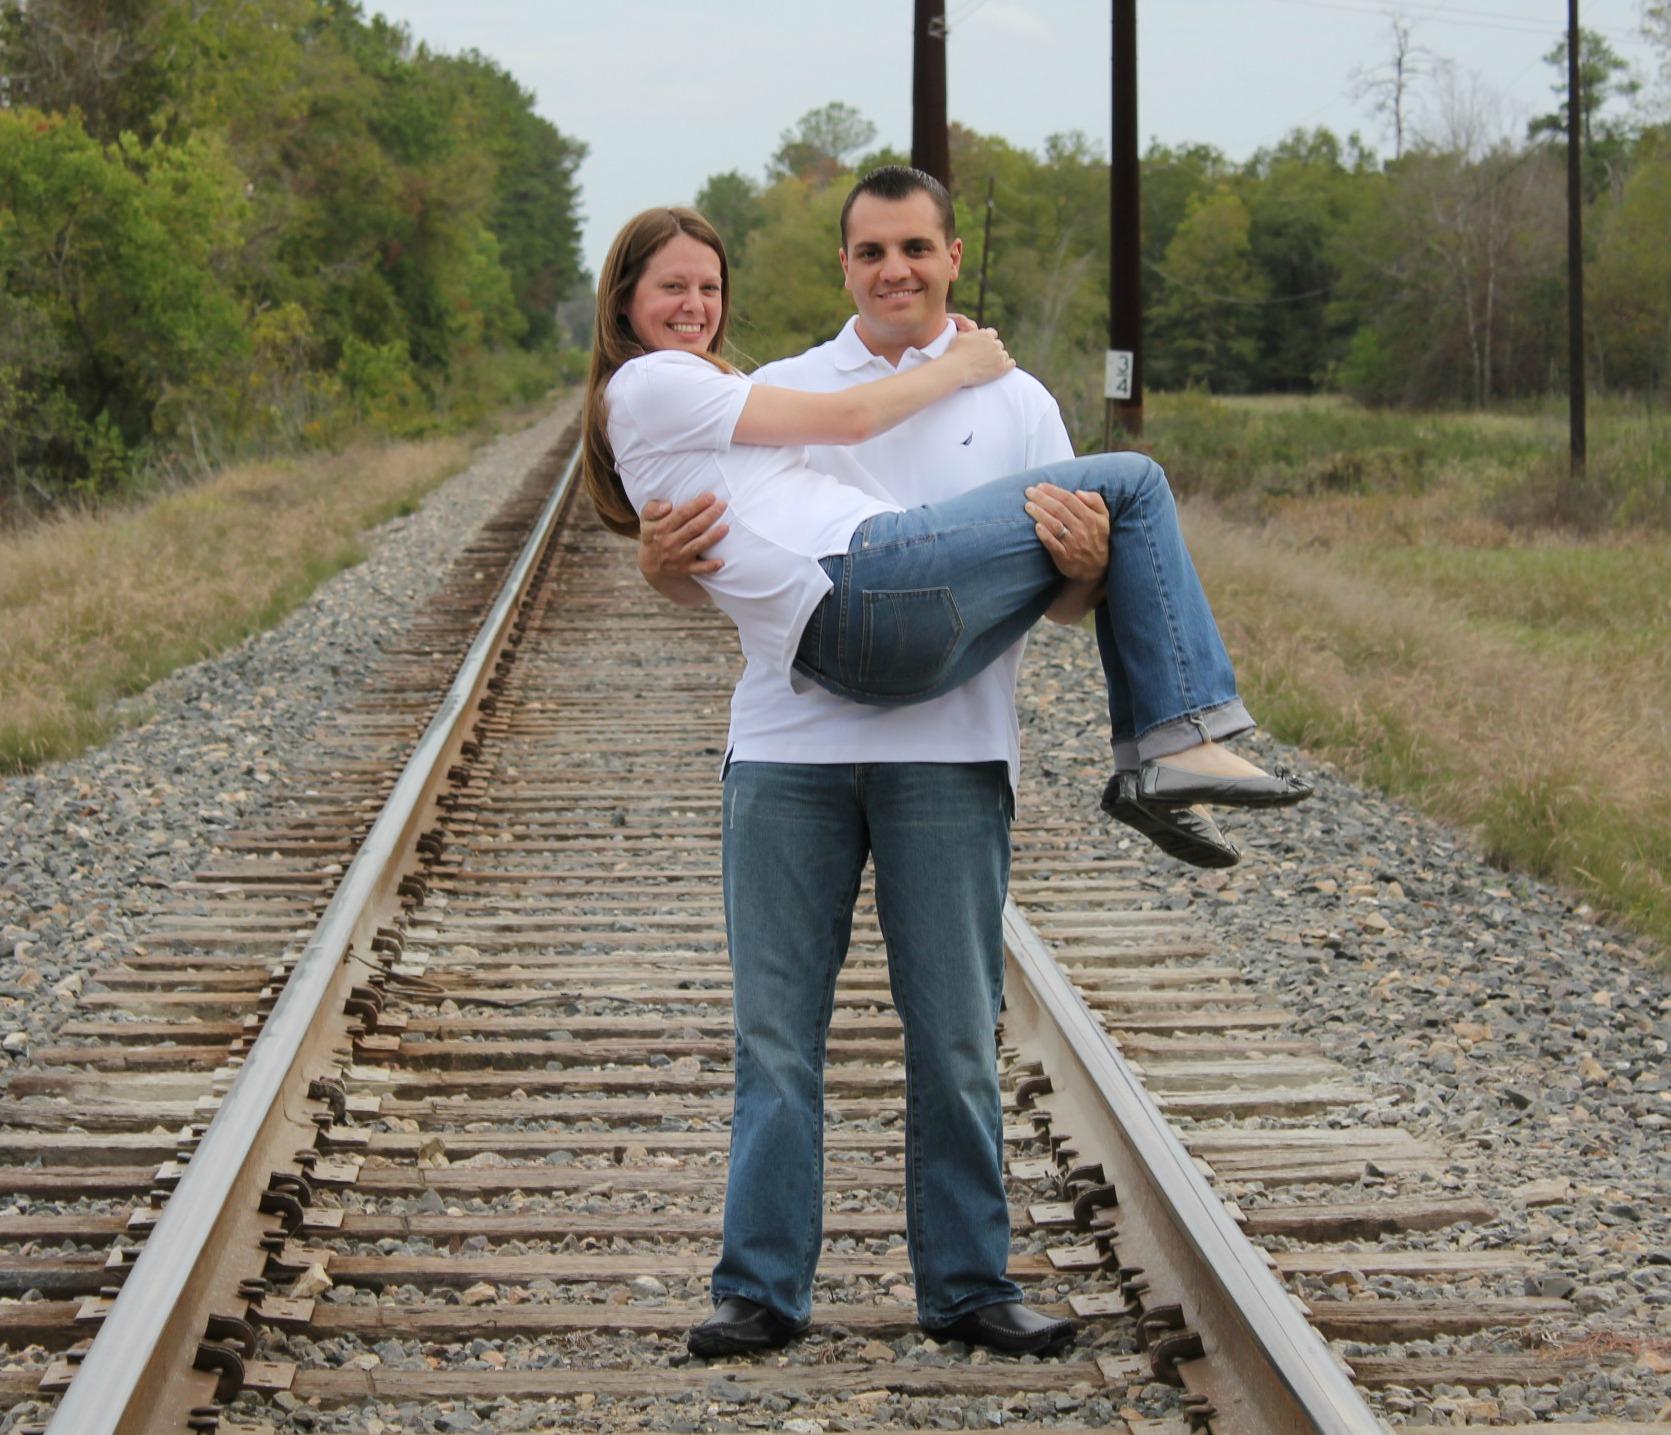 couple on a train track